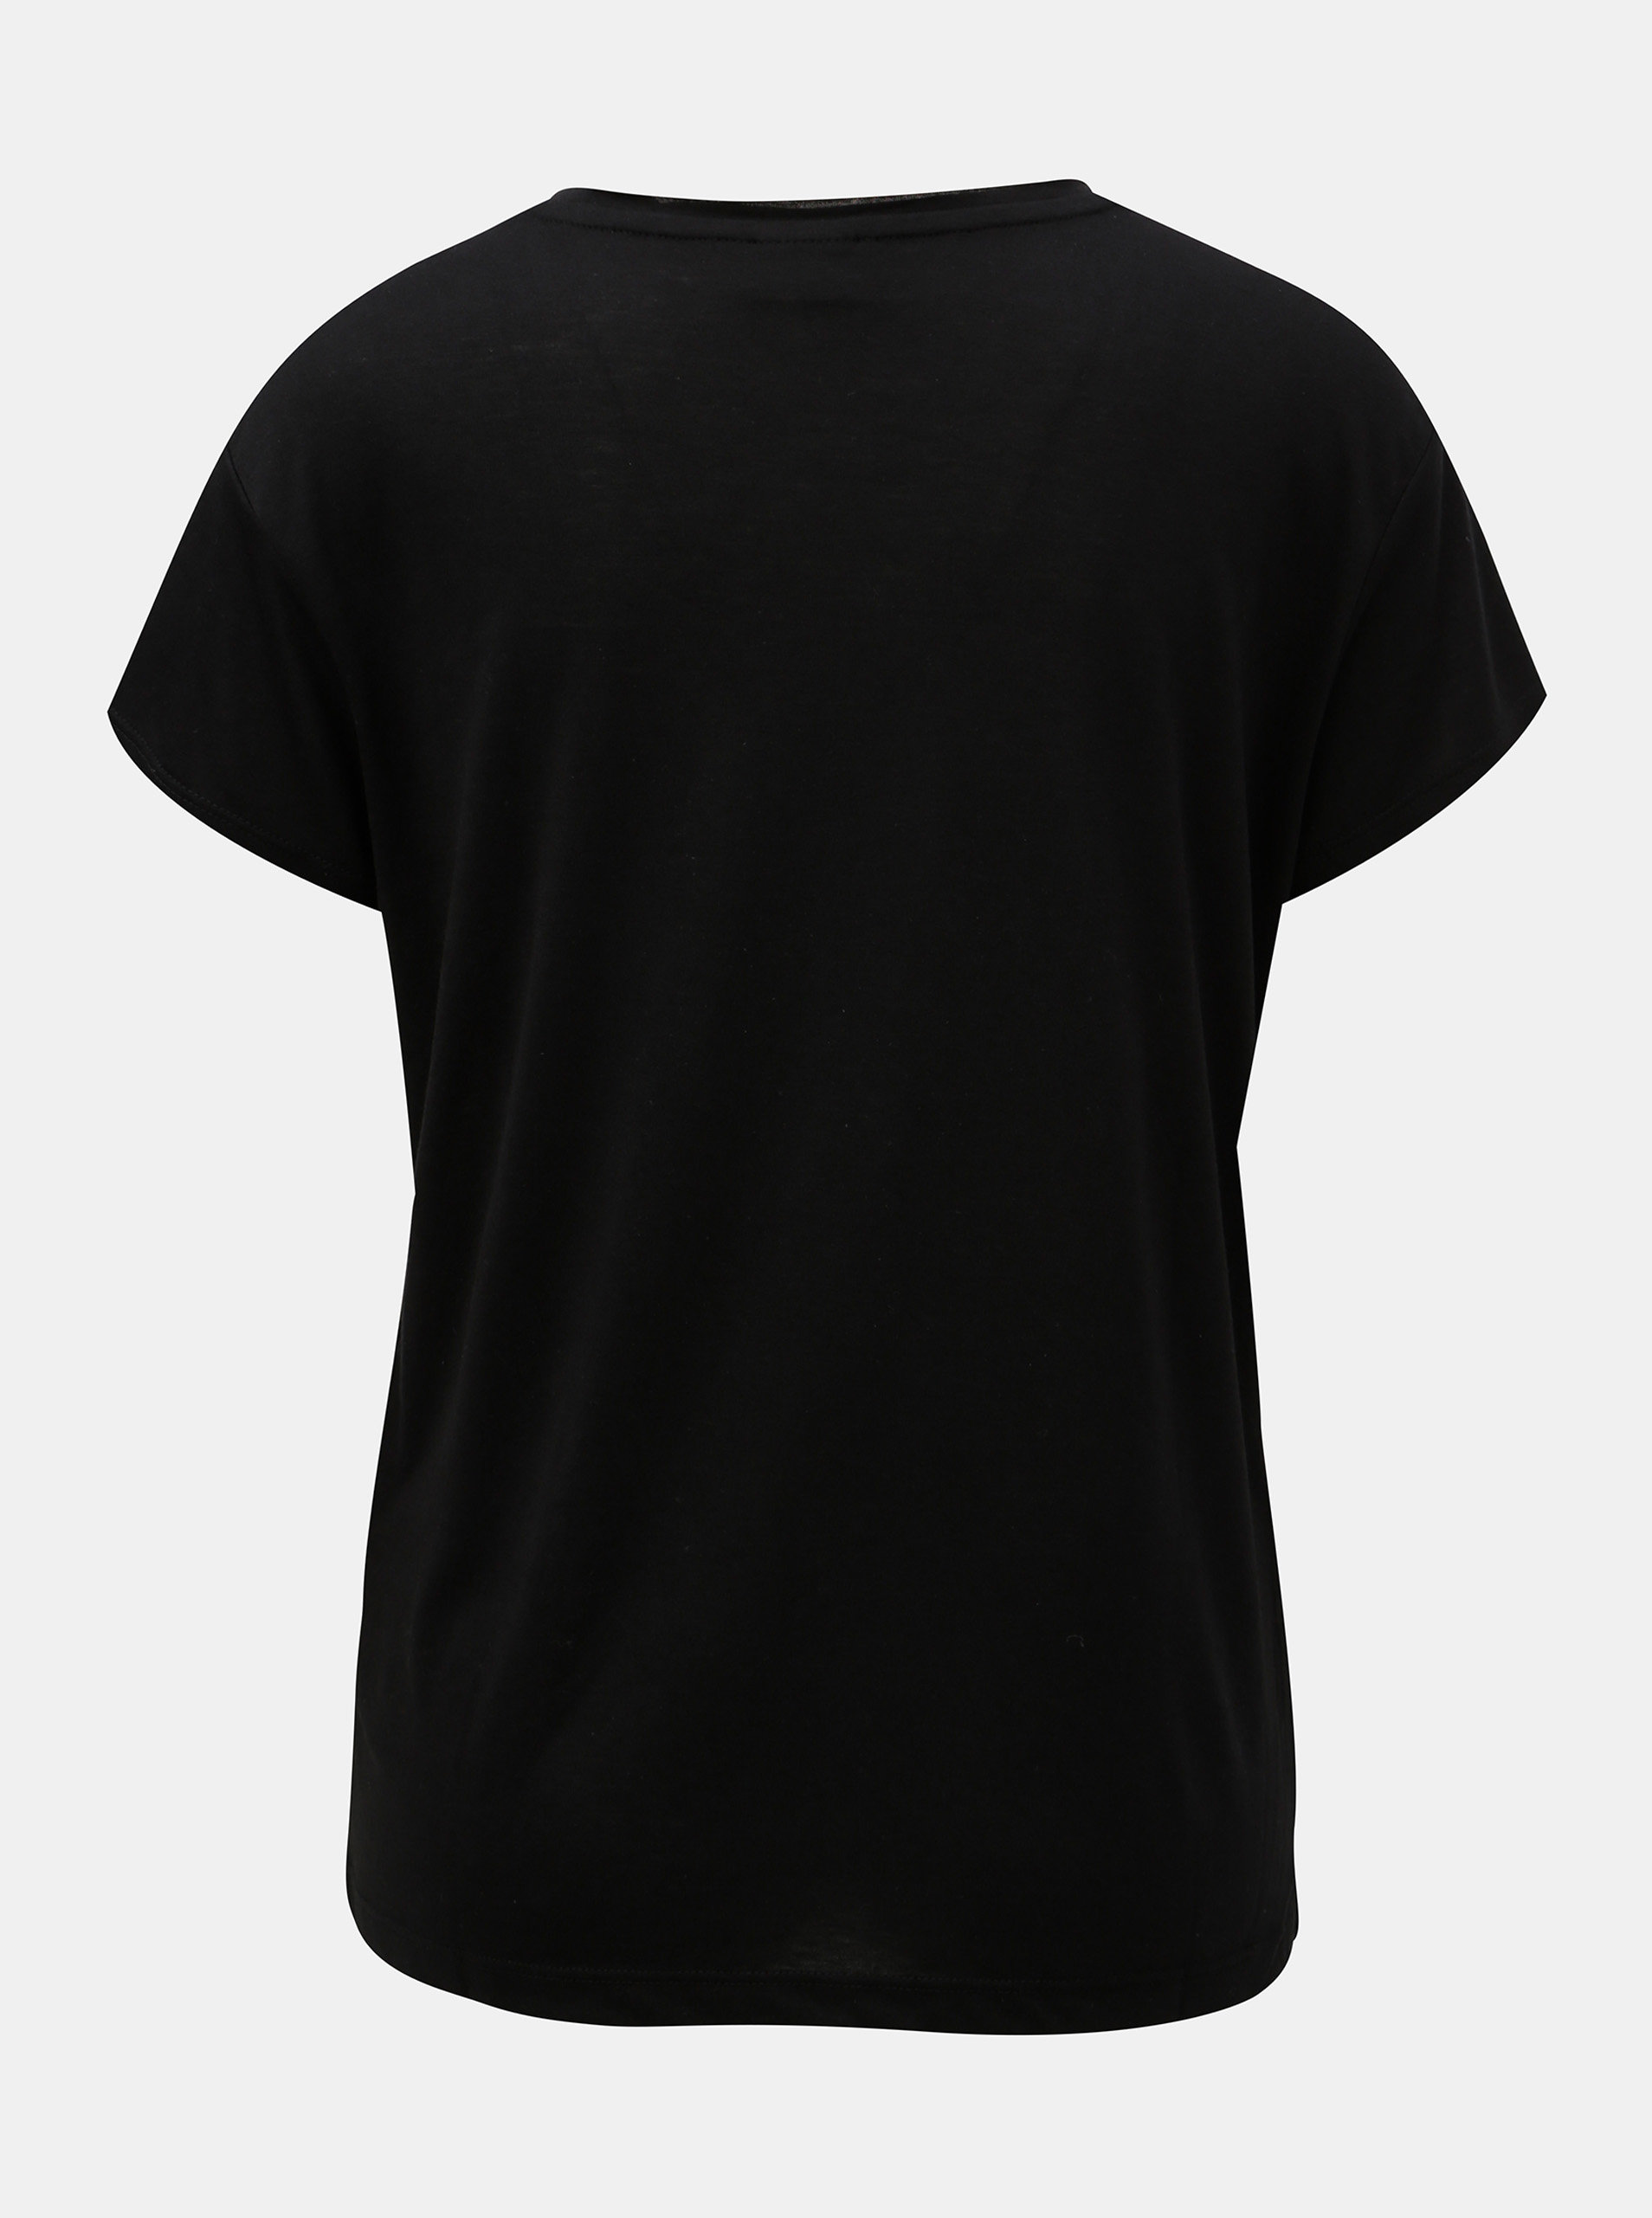 1406e92b4fec Čierne tričko s potlačou a semišovým nápisom Jacqueline de Yong Roa ...